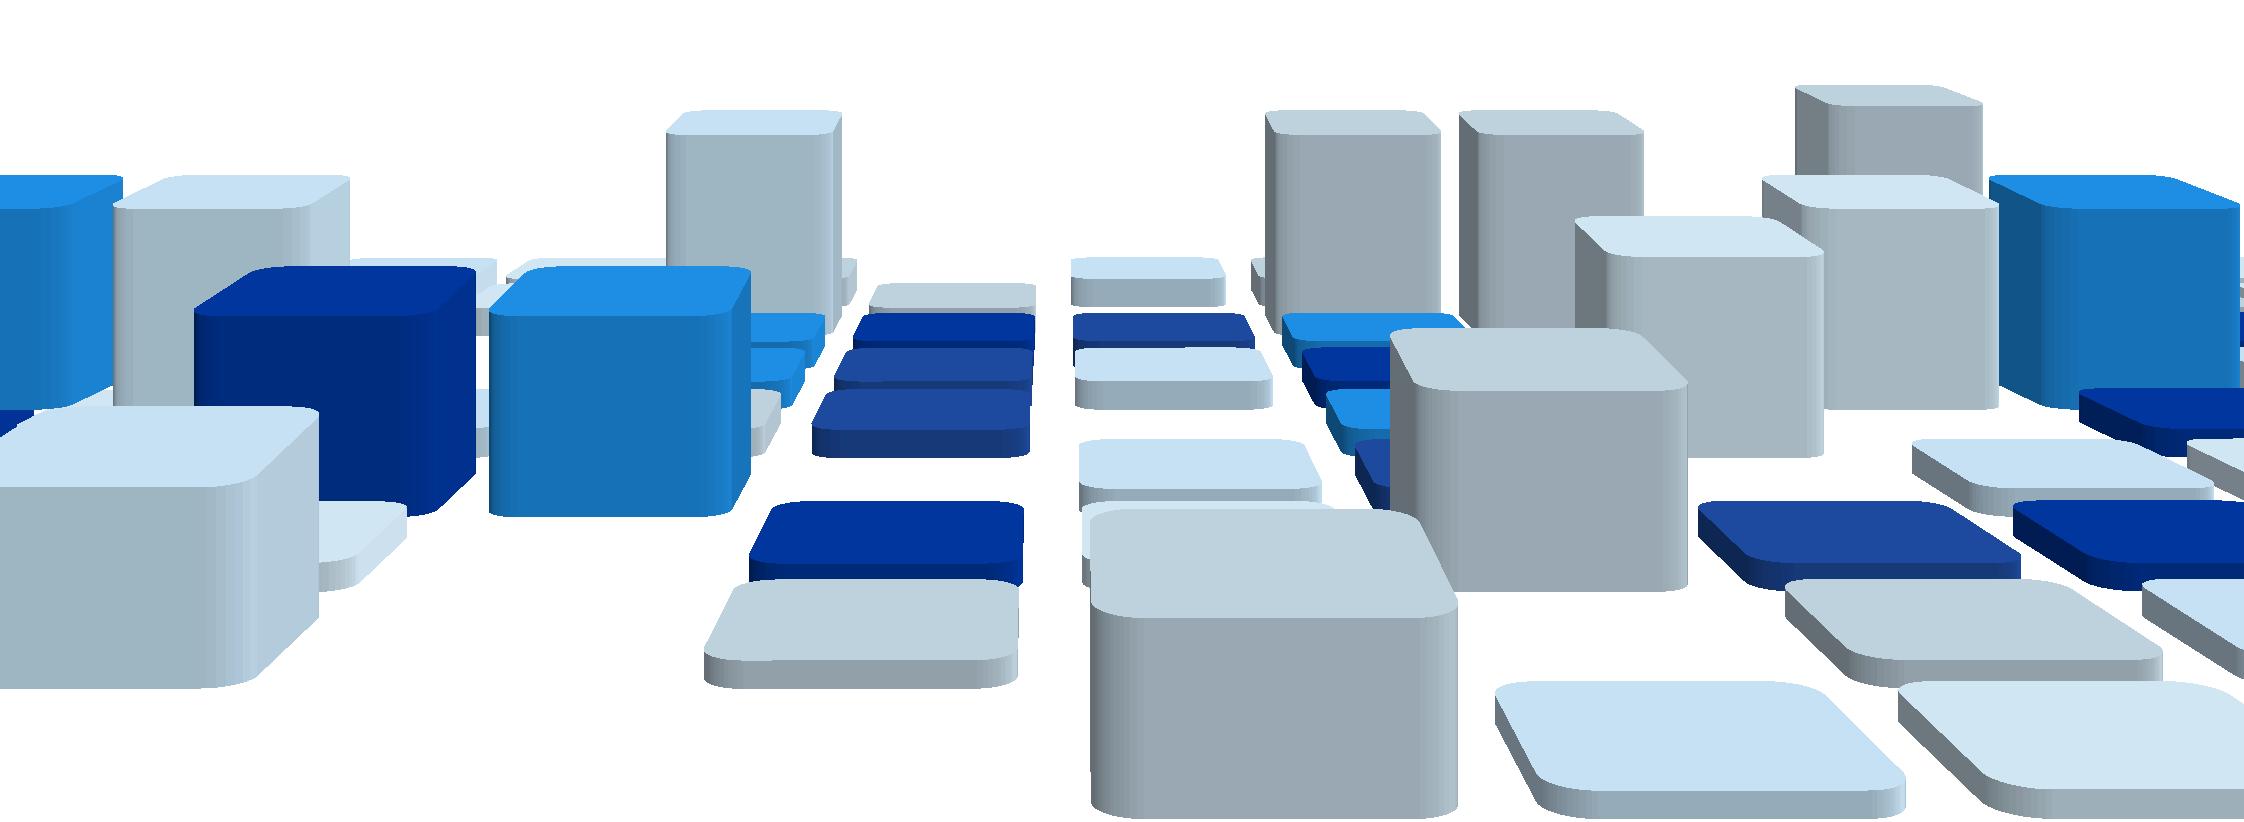 Three space d computer. Cube clipart dimensional